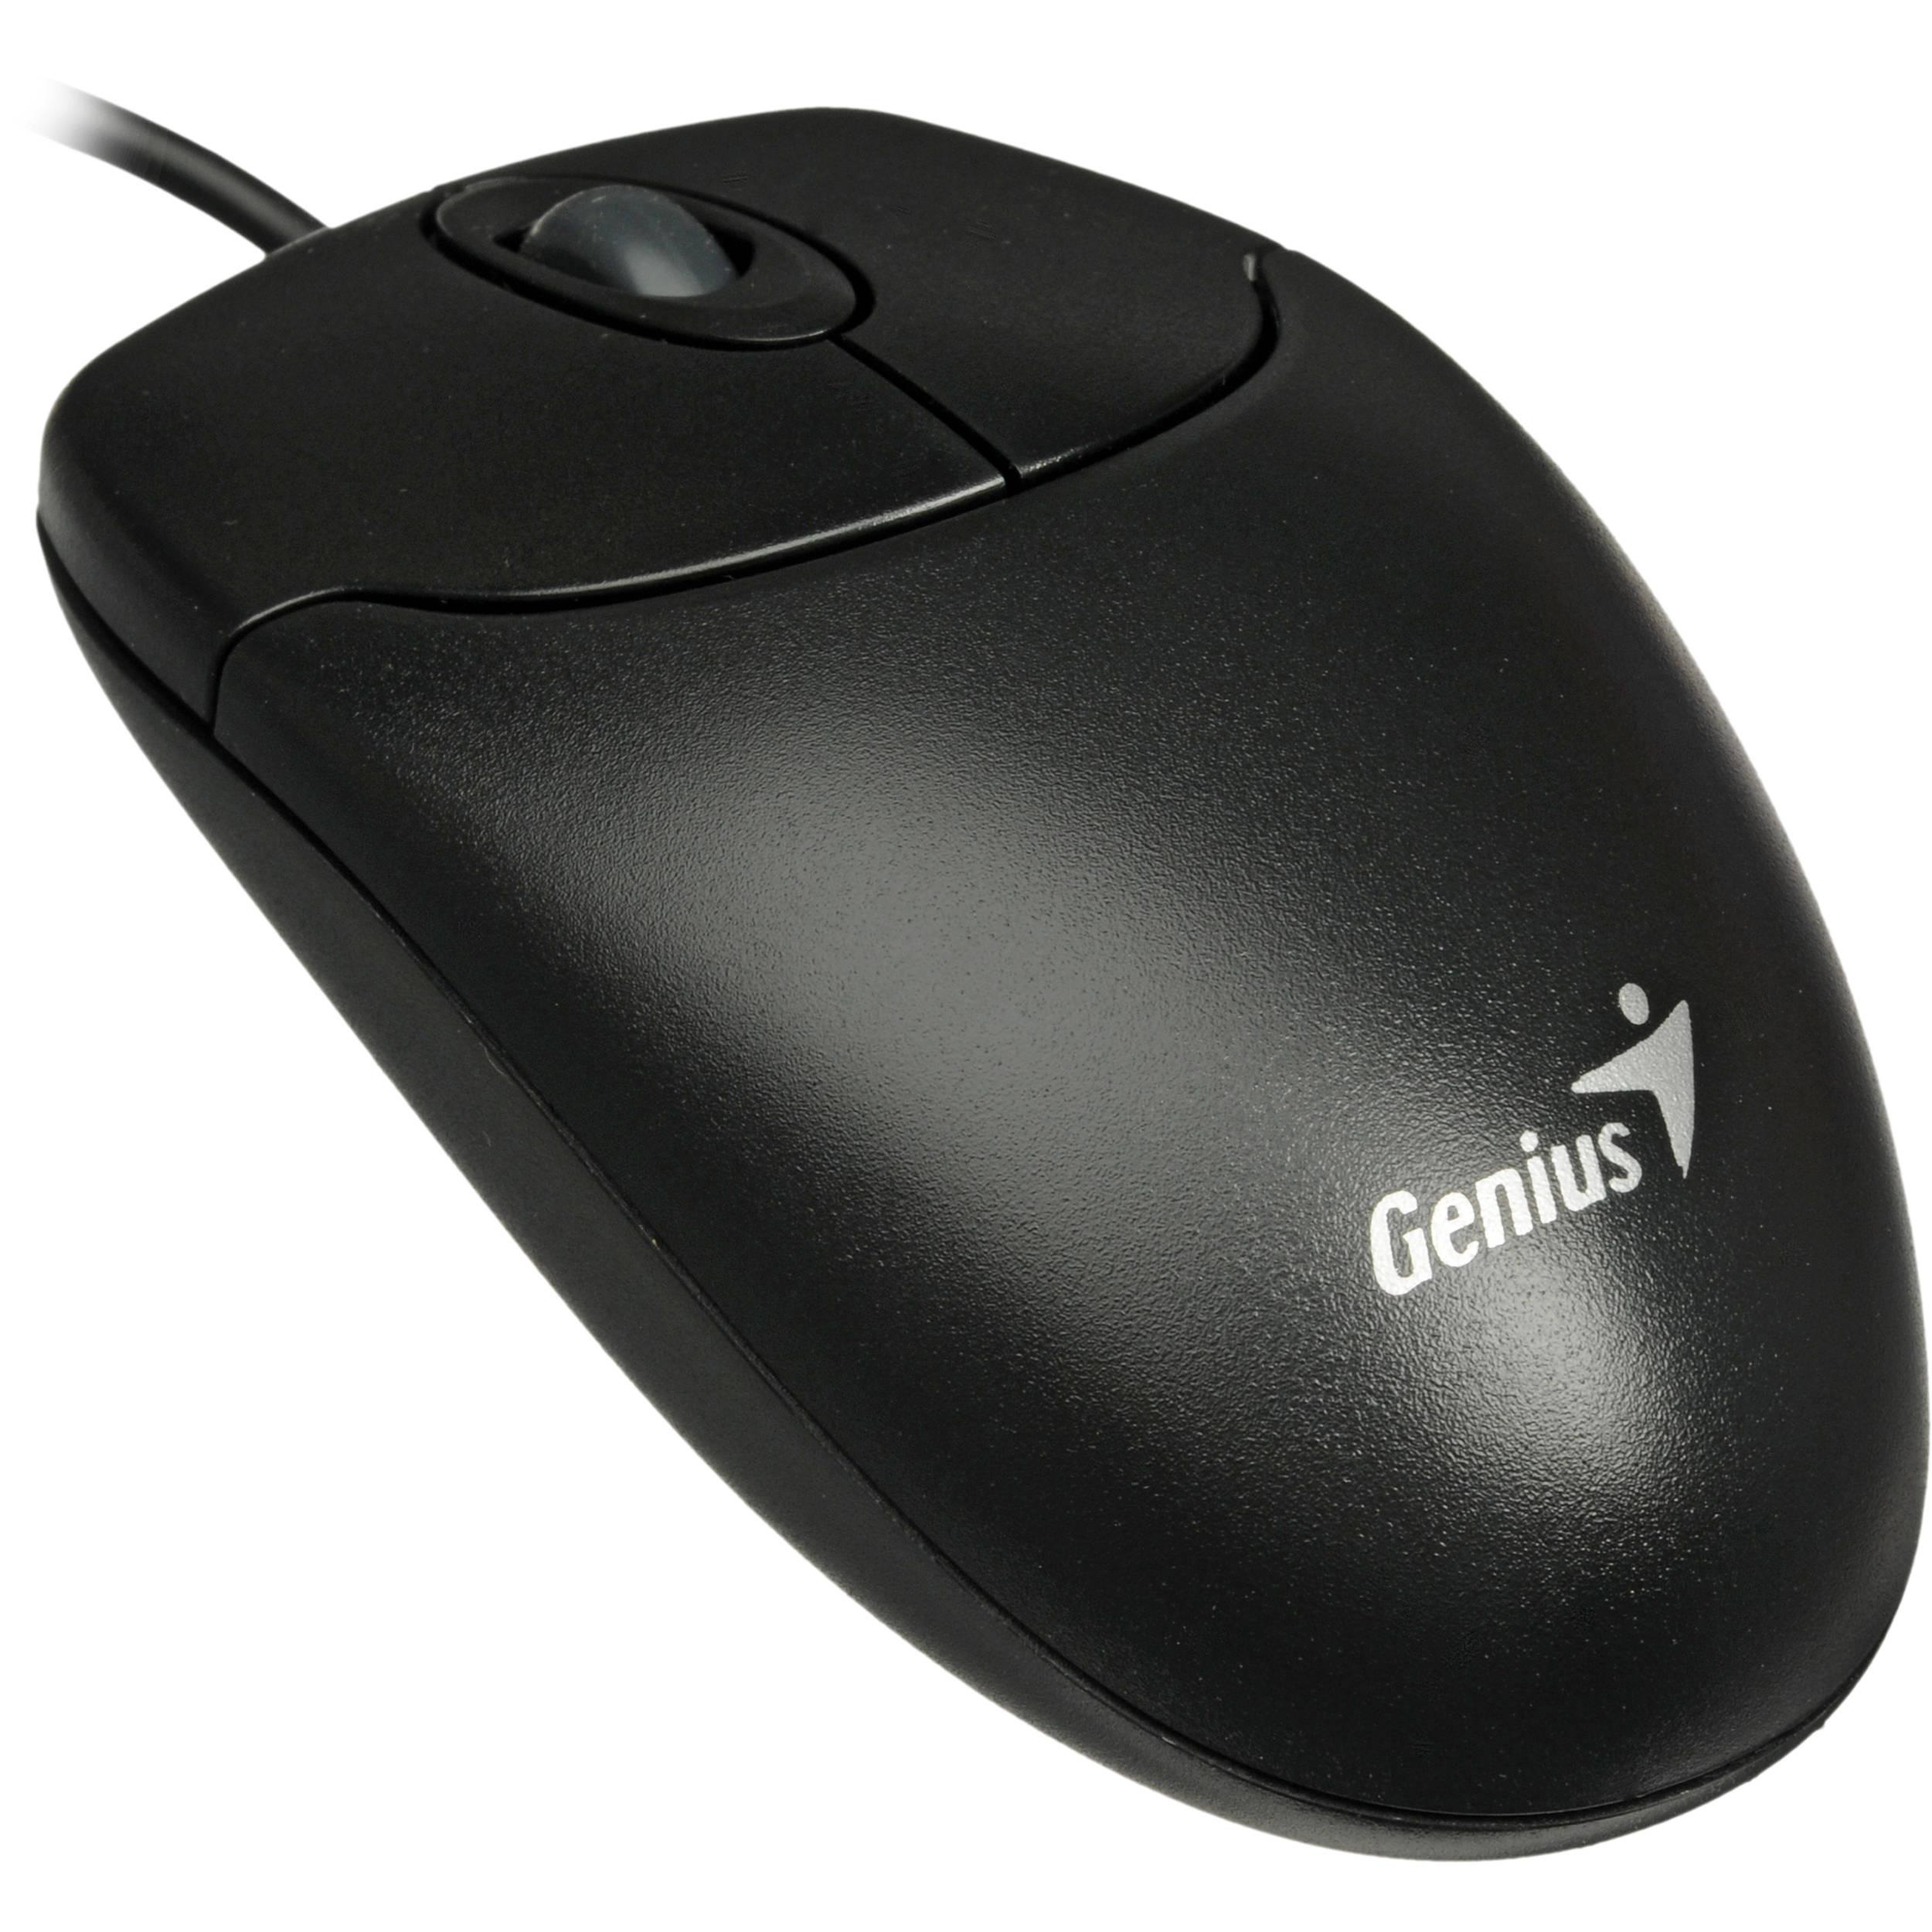 Genius NetScroll 120 Mouse Vista